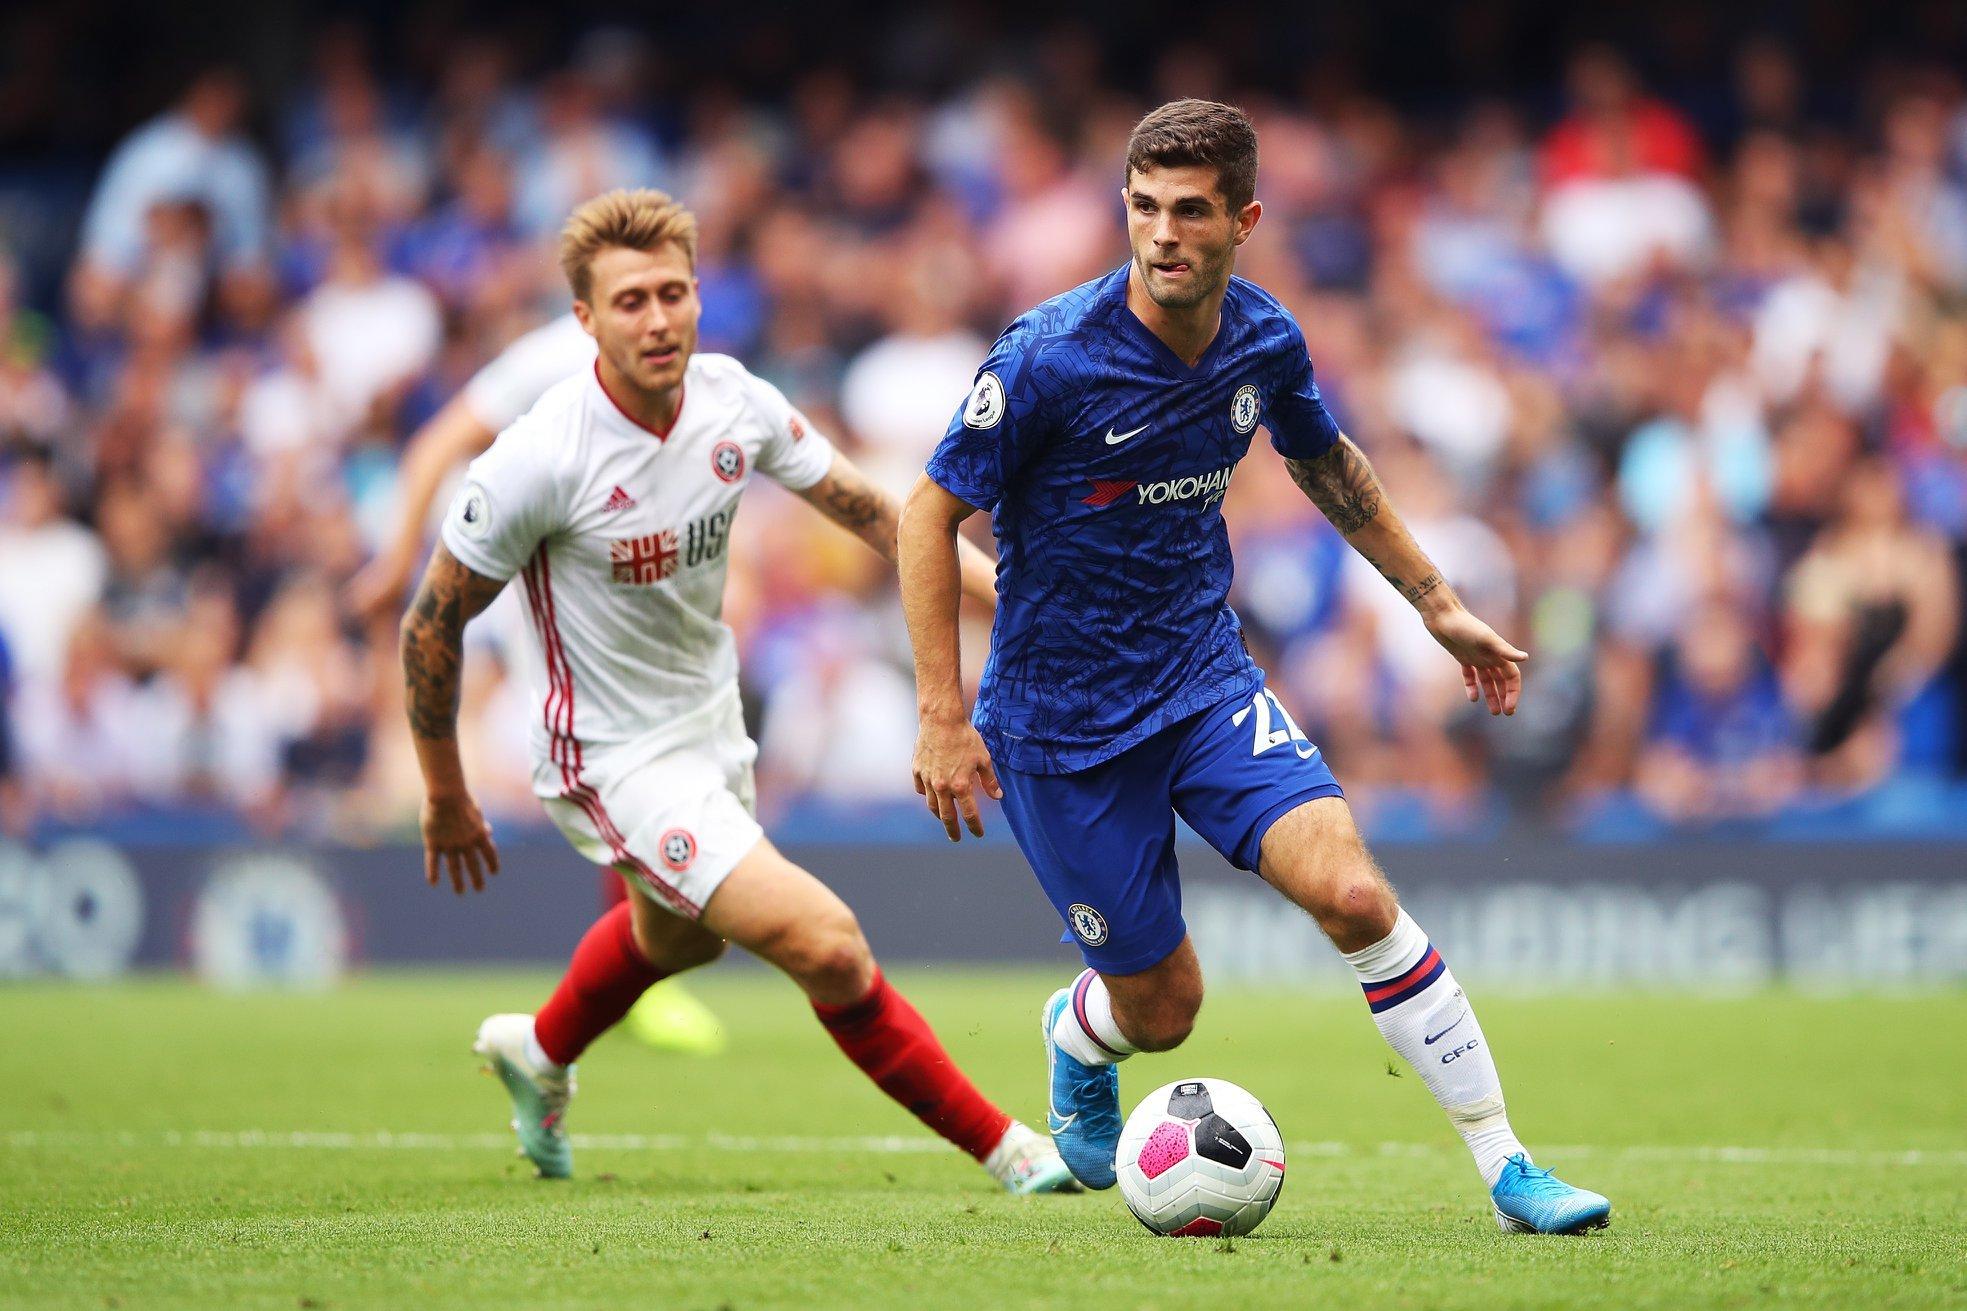 «Шеффилд Юнайтед» — «Челси»: прогноз и ставка Дениса Казанского